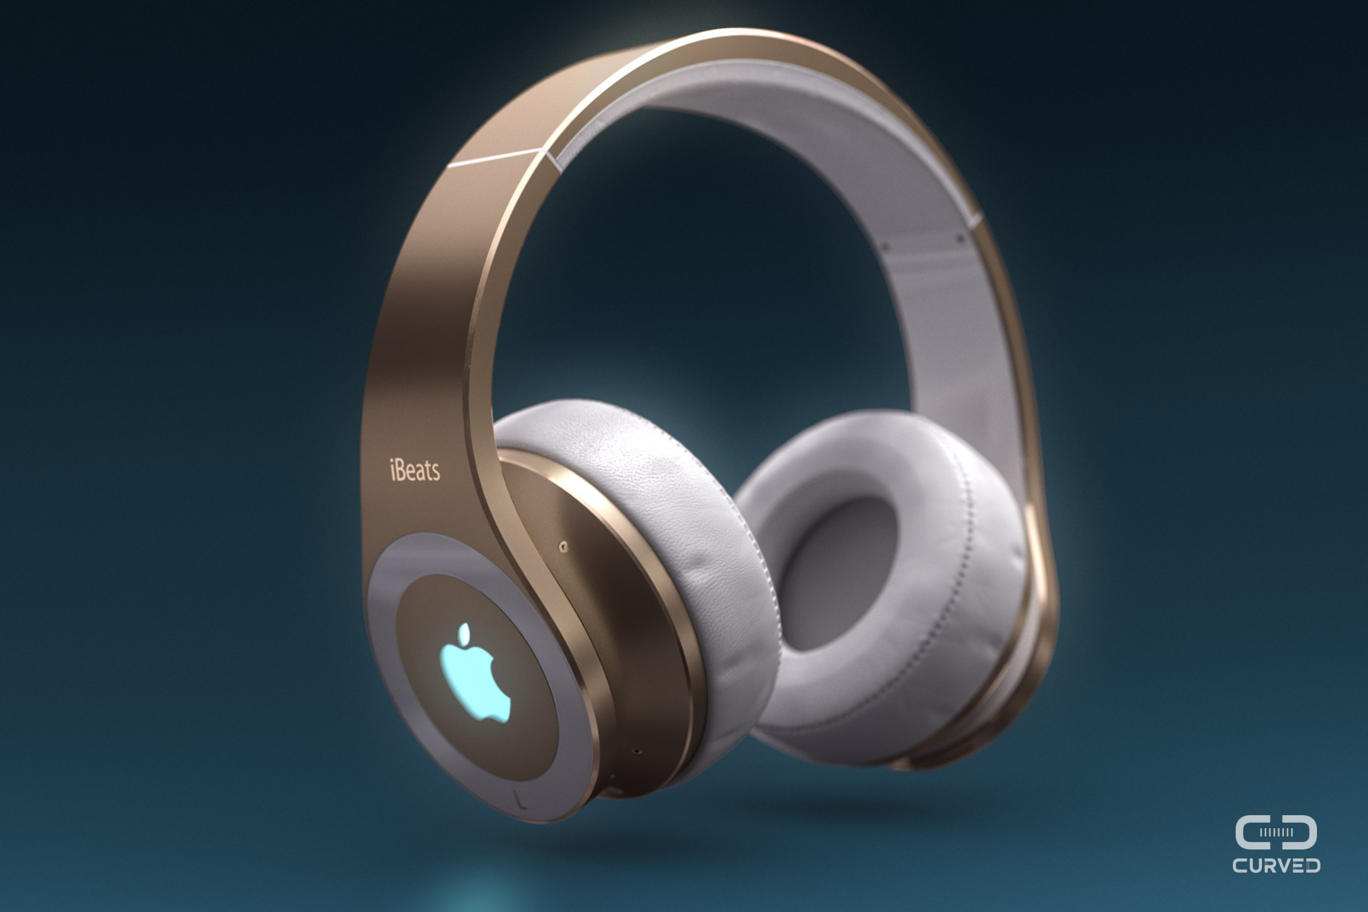 słuchawki apple 7